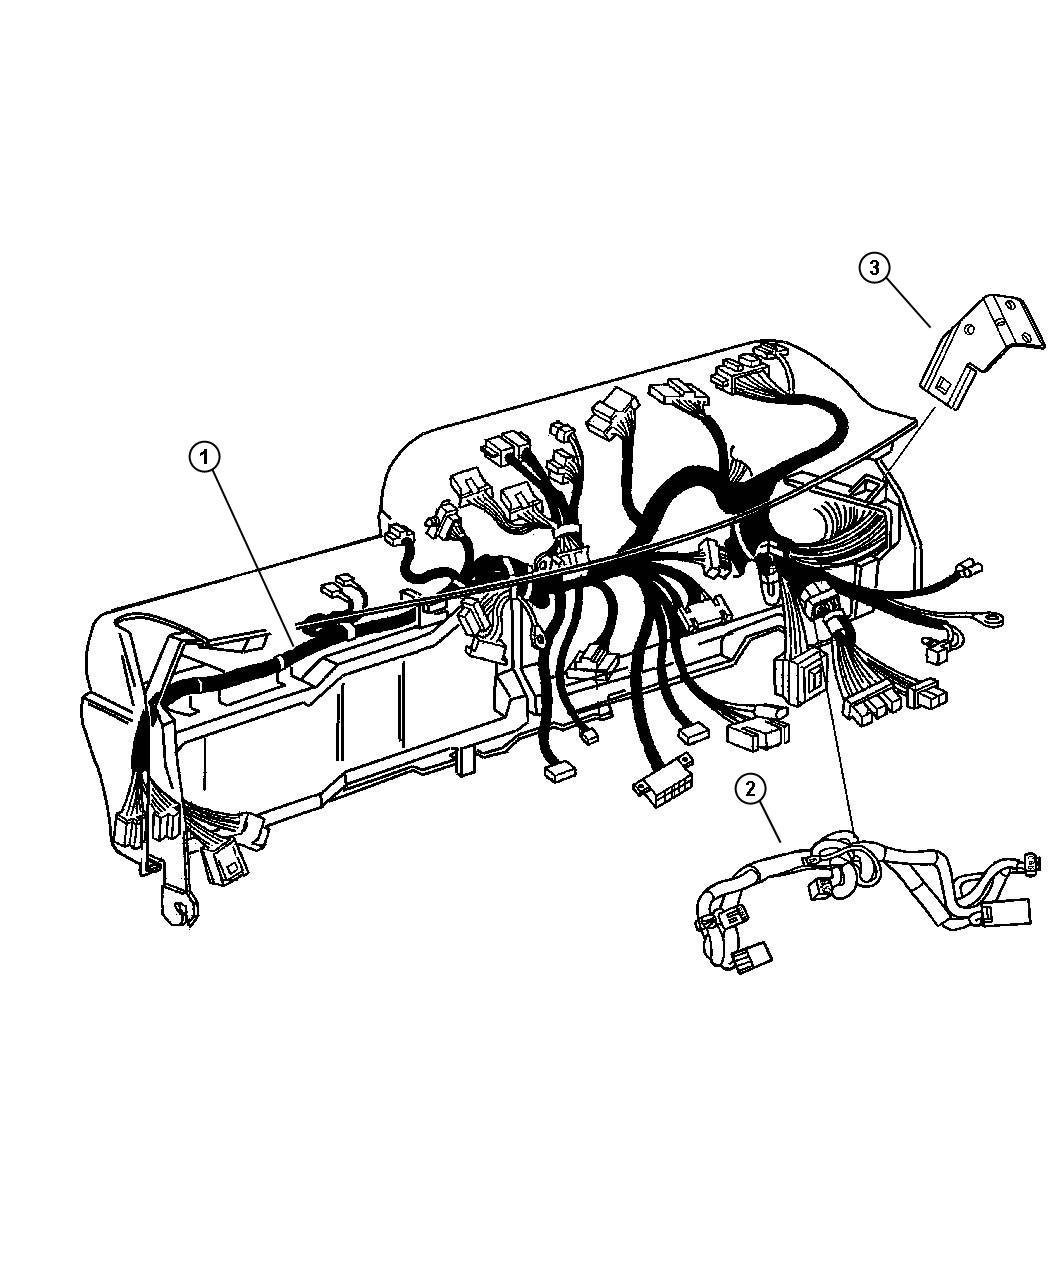 2009 Dodge Ram 1500 Wiring  Instrument Panel    Air Conditioning  Vehicle Information Center